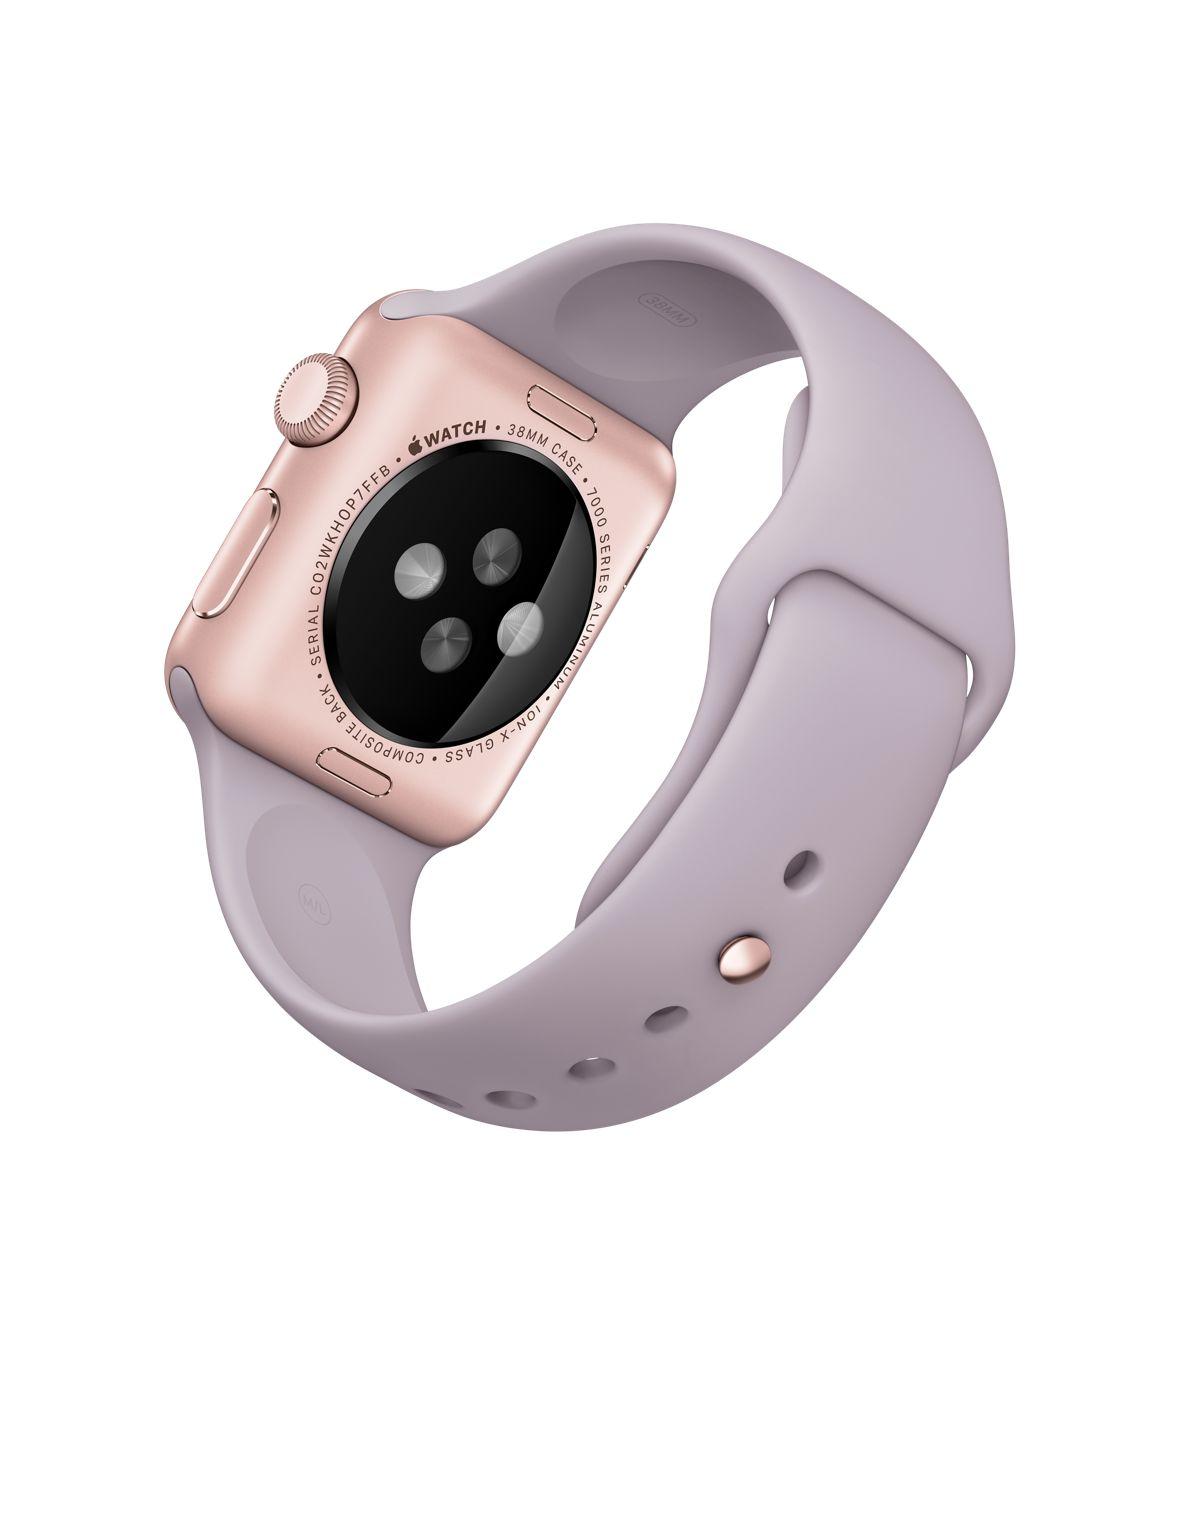 Apple Watch Sport 38mm Rose Gold with Lavender Sport Band (MLCH2), Эппл Вотч Спорт 38мм Розовое золото с спортивным ремешком (MLCH2)